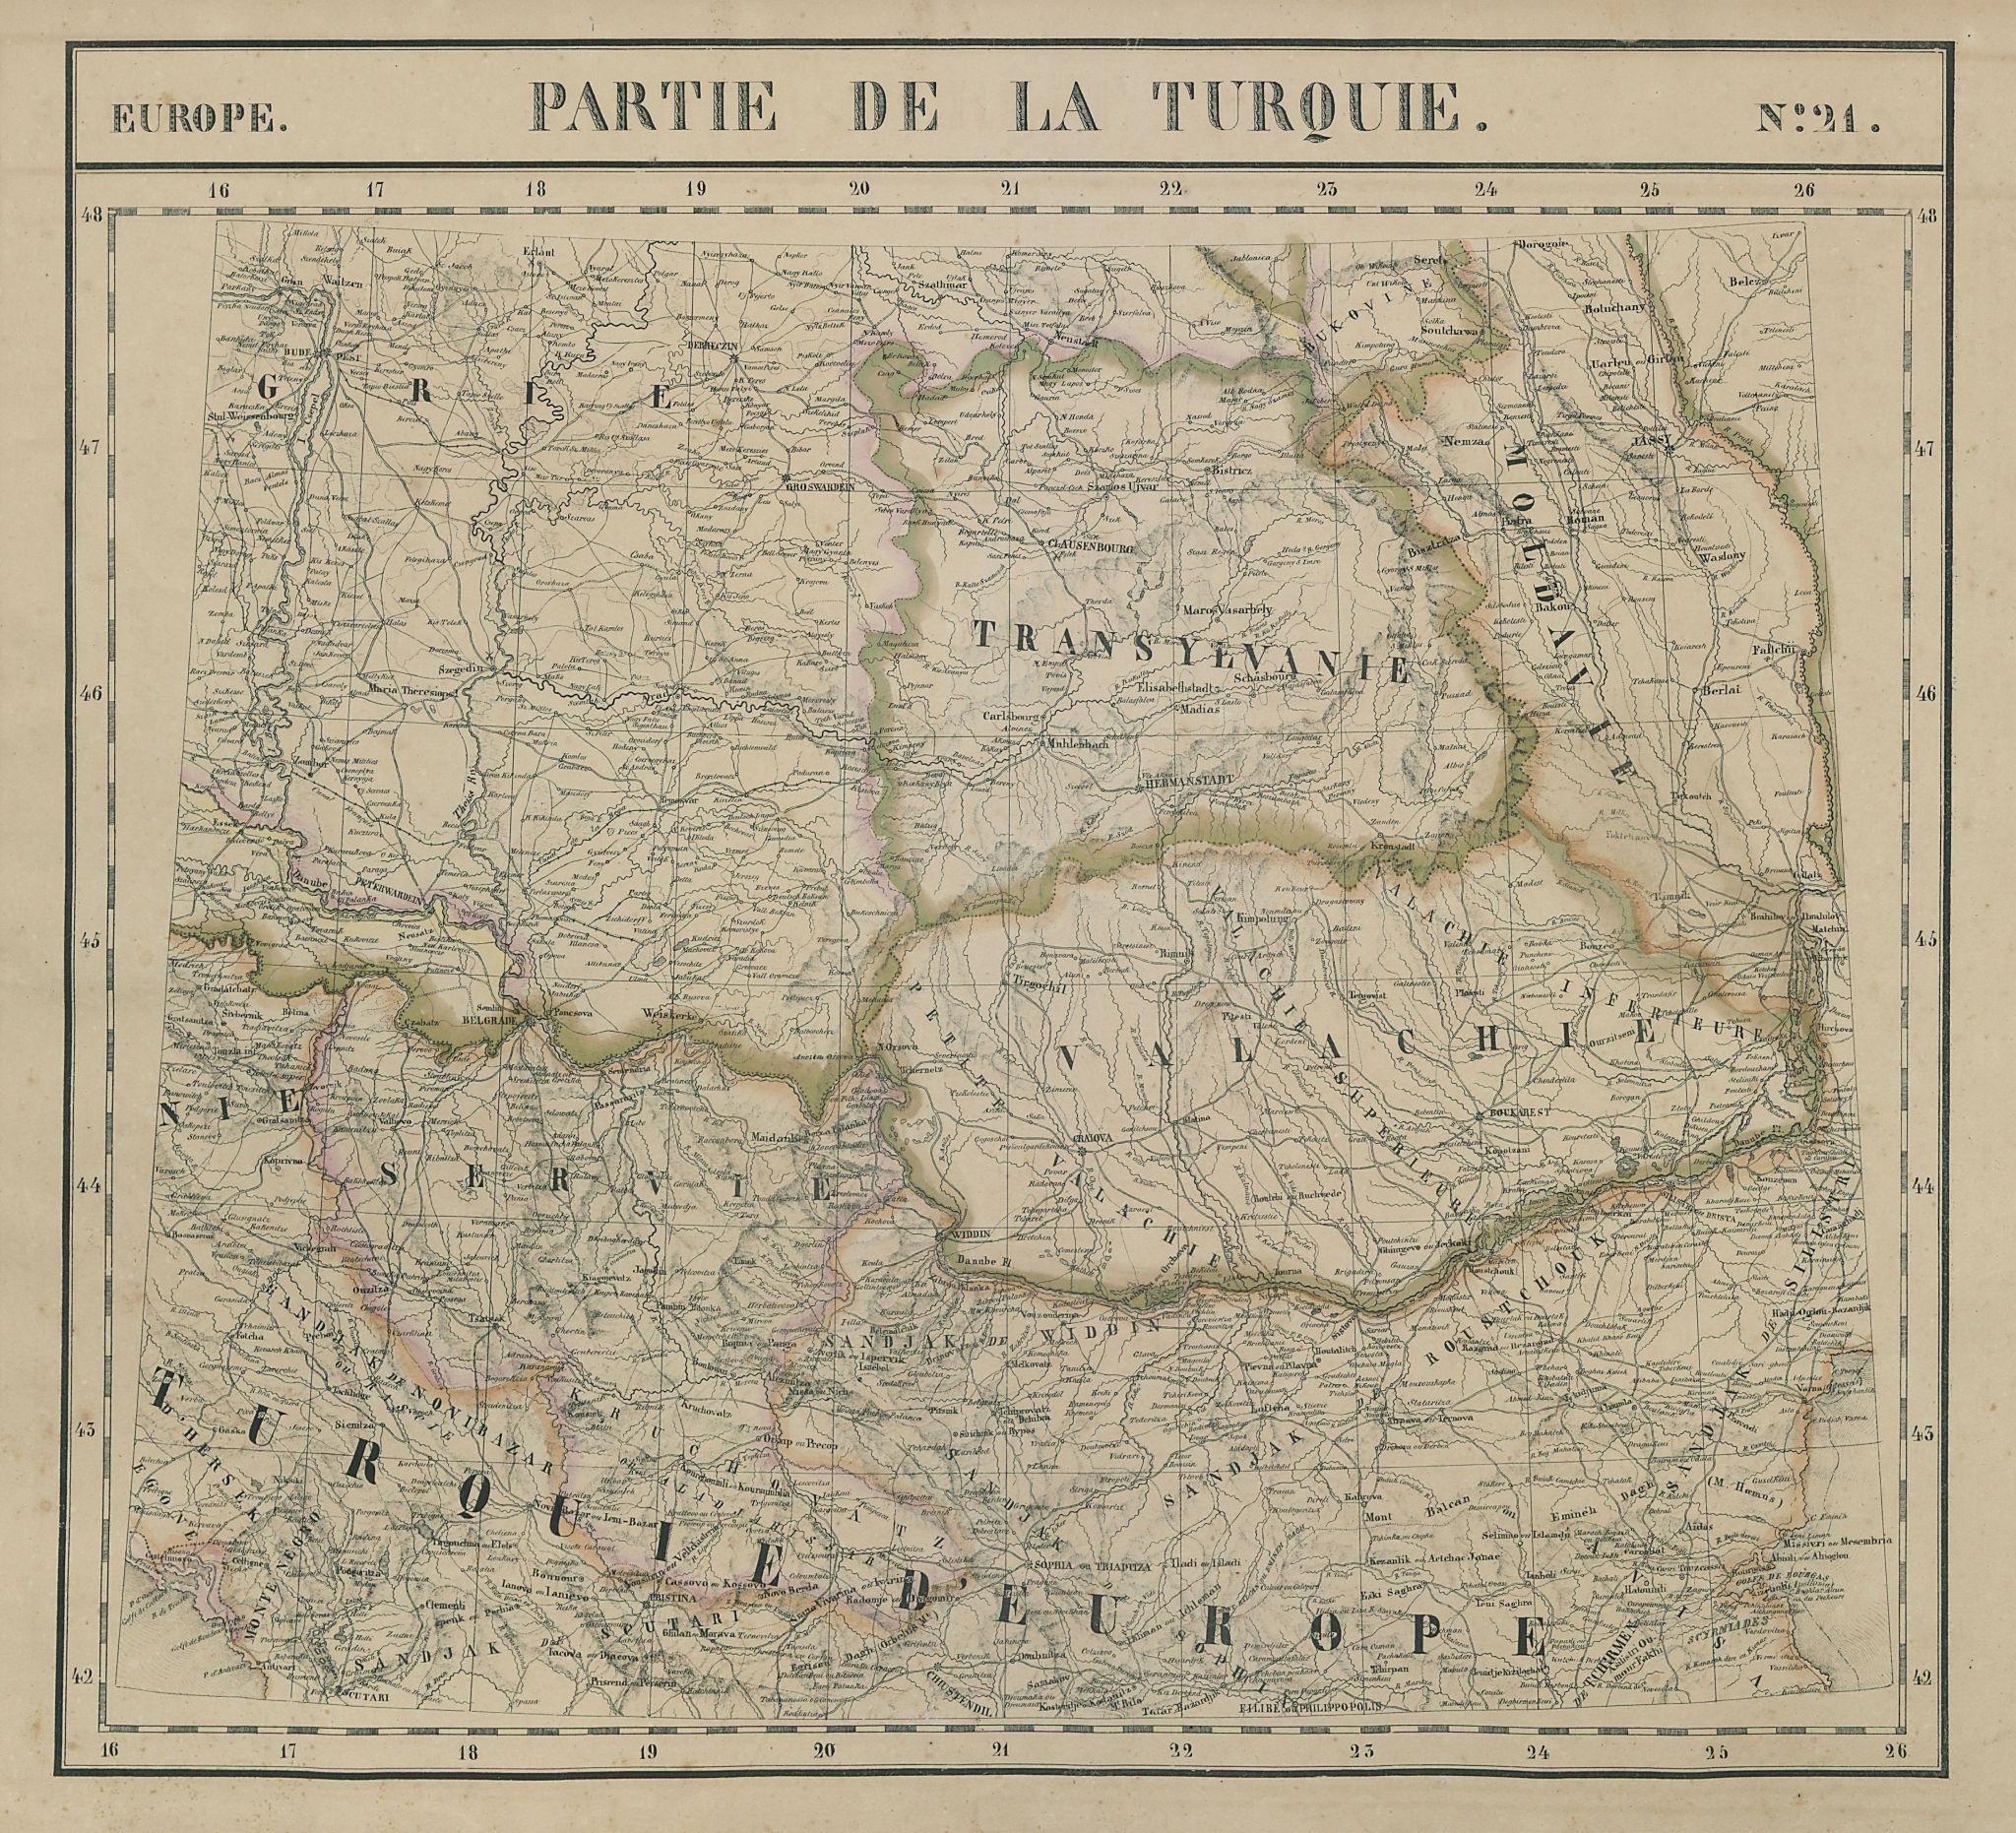 Europe. Turquie #21 Romania Serbia Montenegro Bulgaria. VANDERMAELEN 1827 map